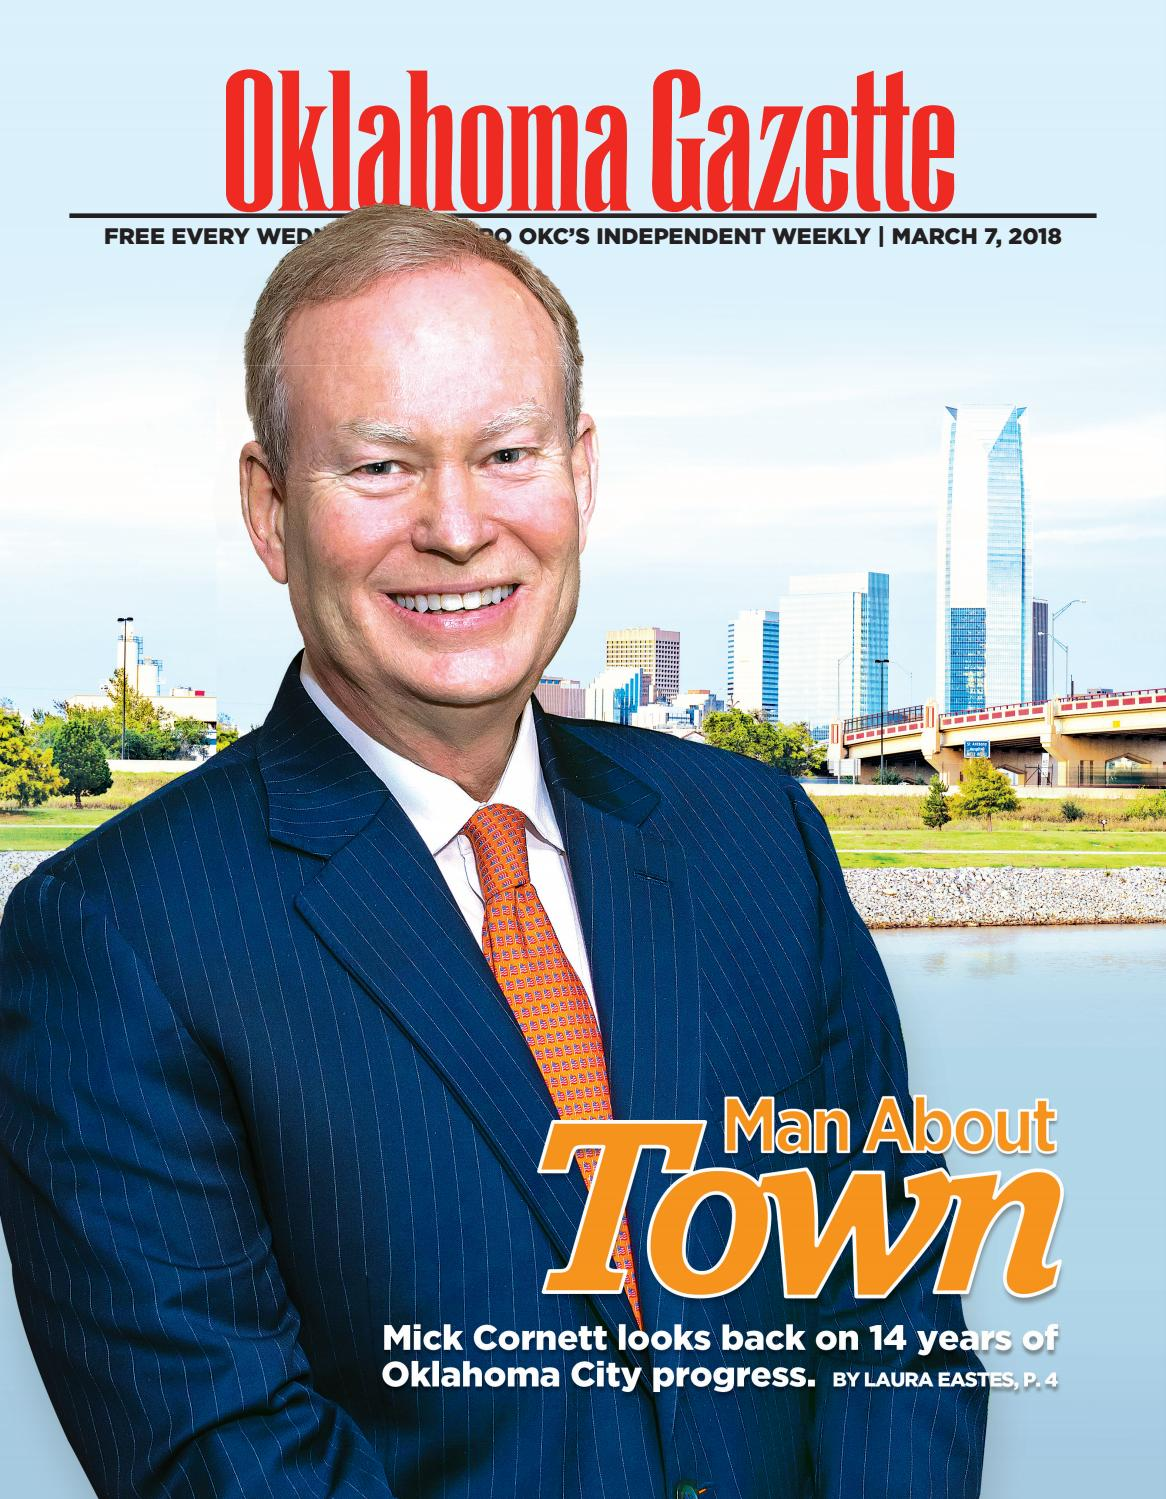 2c439e2b6f Man About Town by Oklahoma Gazette - issuu